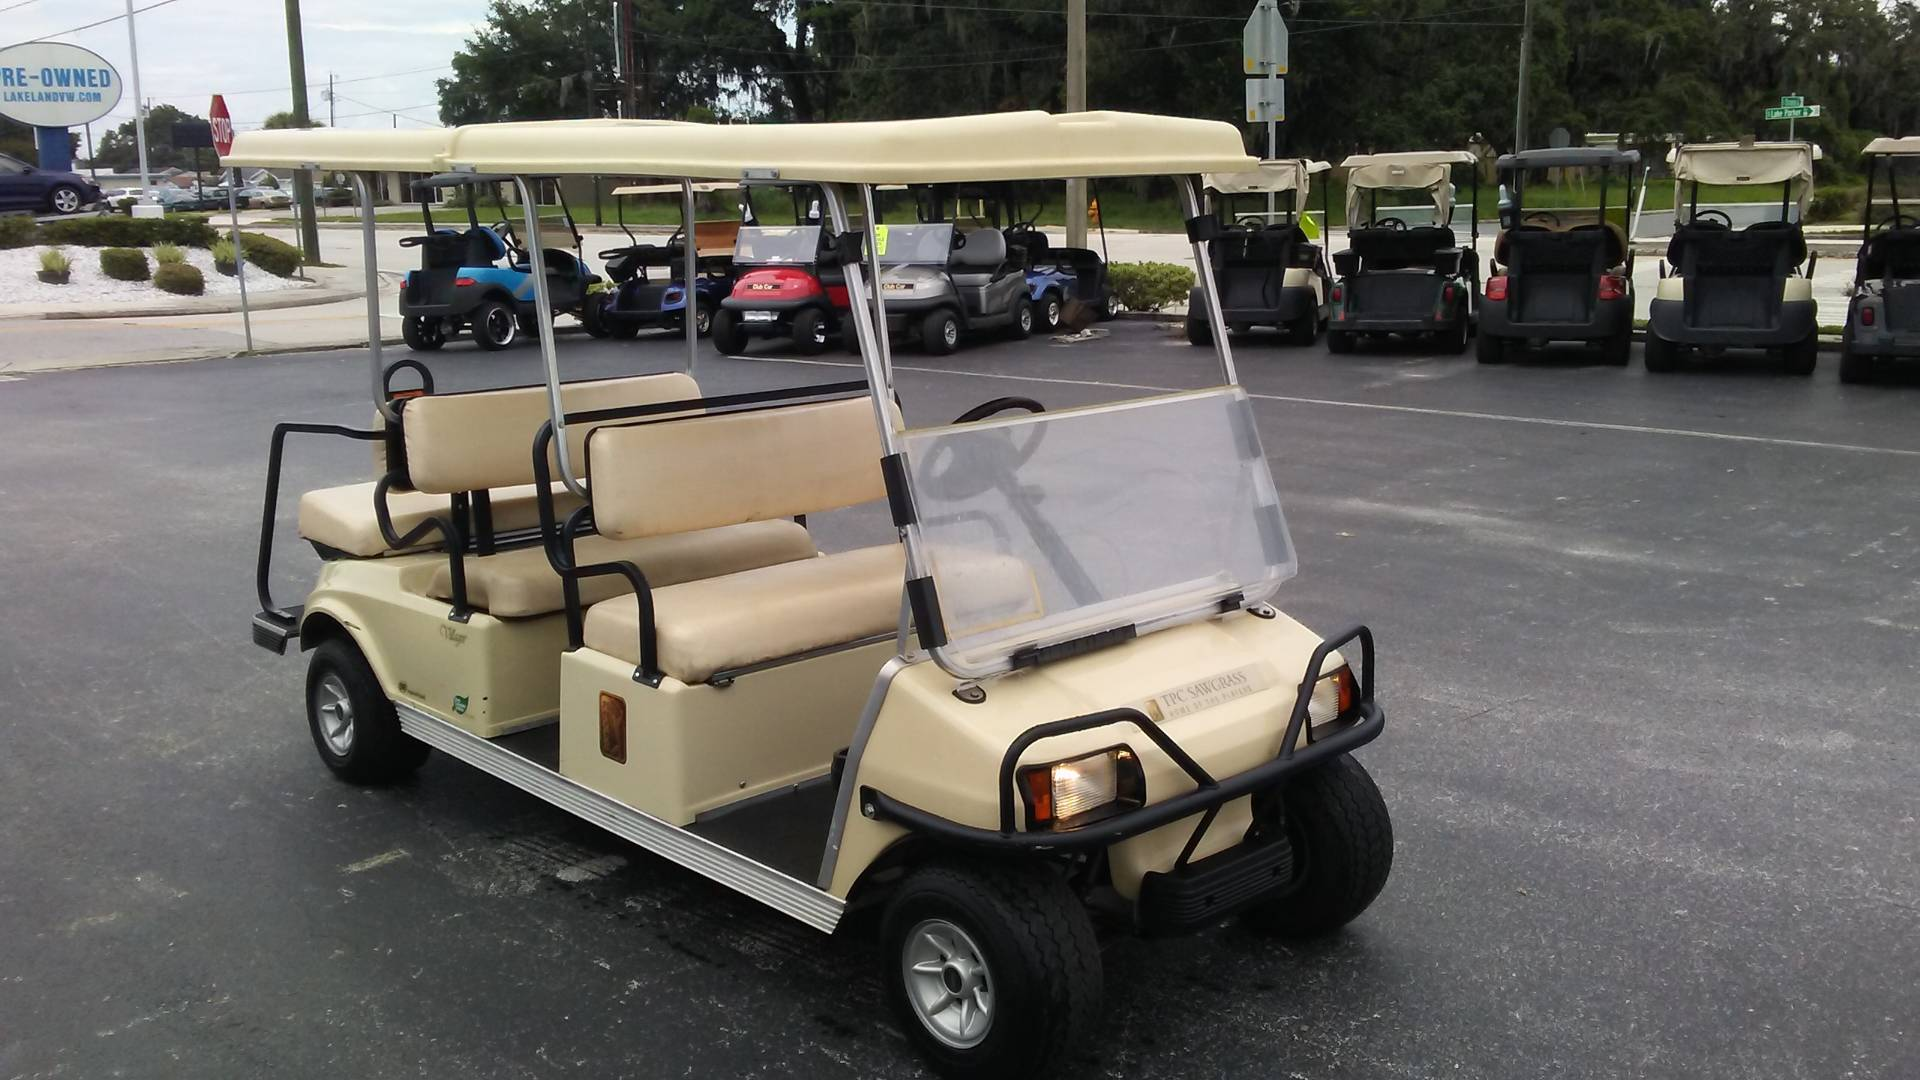 Club Car Golf Cart Beer Cooler   www.topsimages.com Golf Cart Beer Cooler on golf cart beer keg, golf cart water coolers, golf bag cooler for beer, club cart coolers, commercial beer coolers, 4-seat golf cart for coolers, golf bag coolers for cans, home beer coolers, golf cart champagne coolers, atv beer coolers, golf coolers golf discount, golf cart beer cans, golf cart beer dispensers, golf cart evaporative coolers, custom golf cart coolers, hidden golf bag coolers, golf cart coolers and brackets, golf beverage coolers, golf cart beer kegerator, golf club cooler,